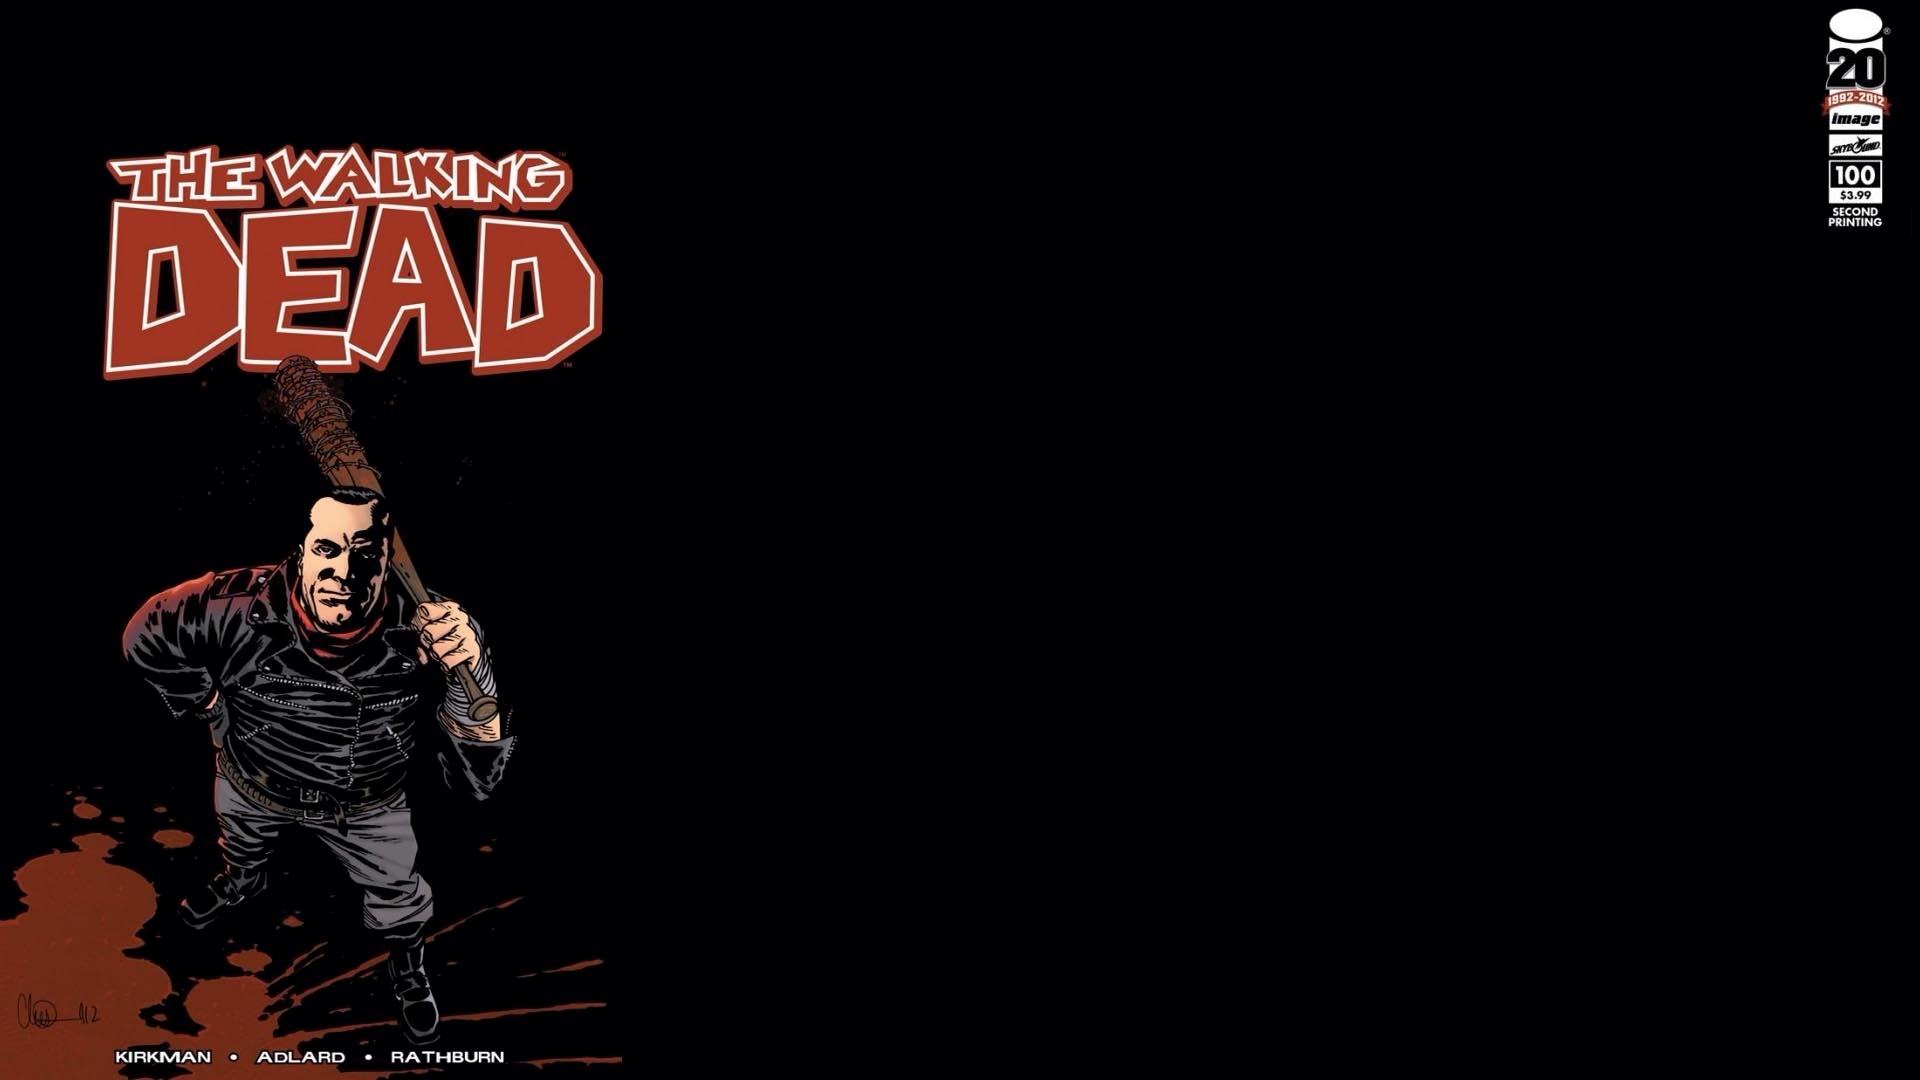 Walking Dead Comic Wallpaper Iphone Comics   the walking dead 1920x1080